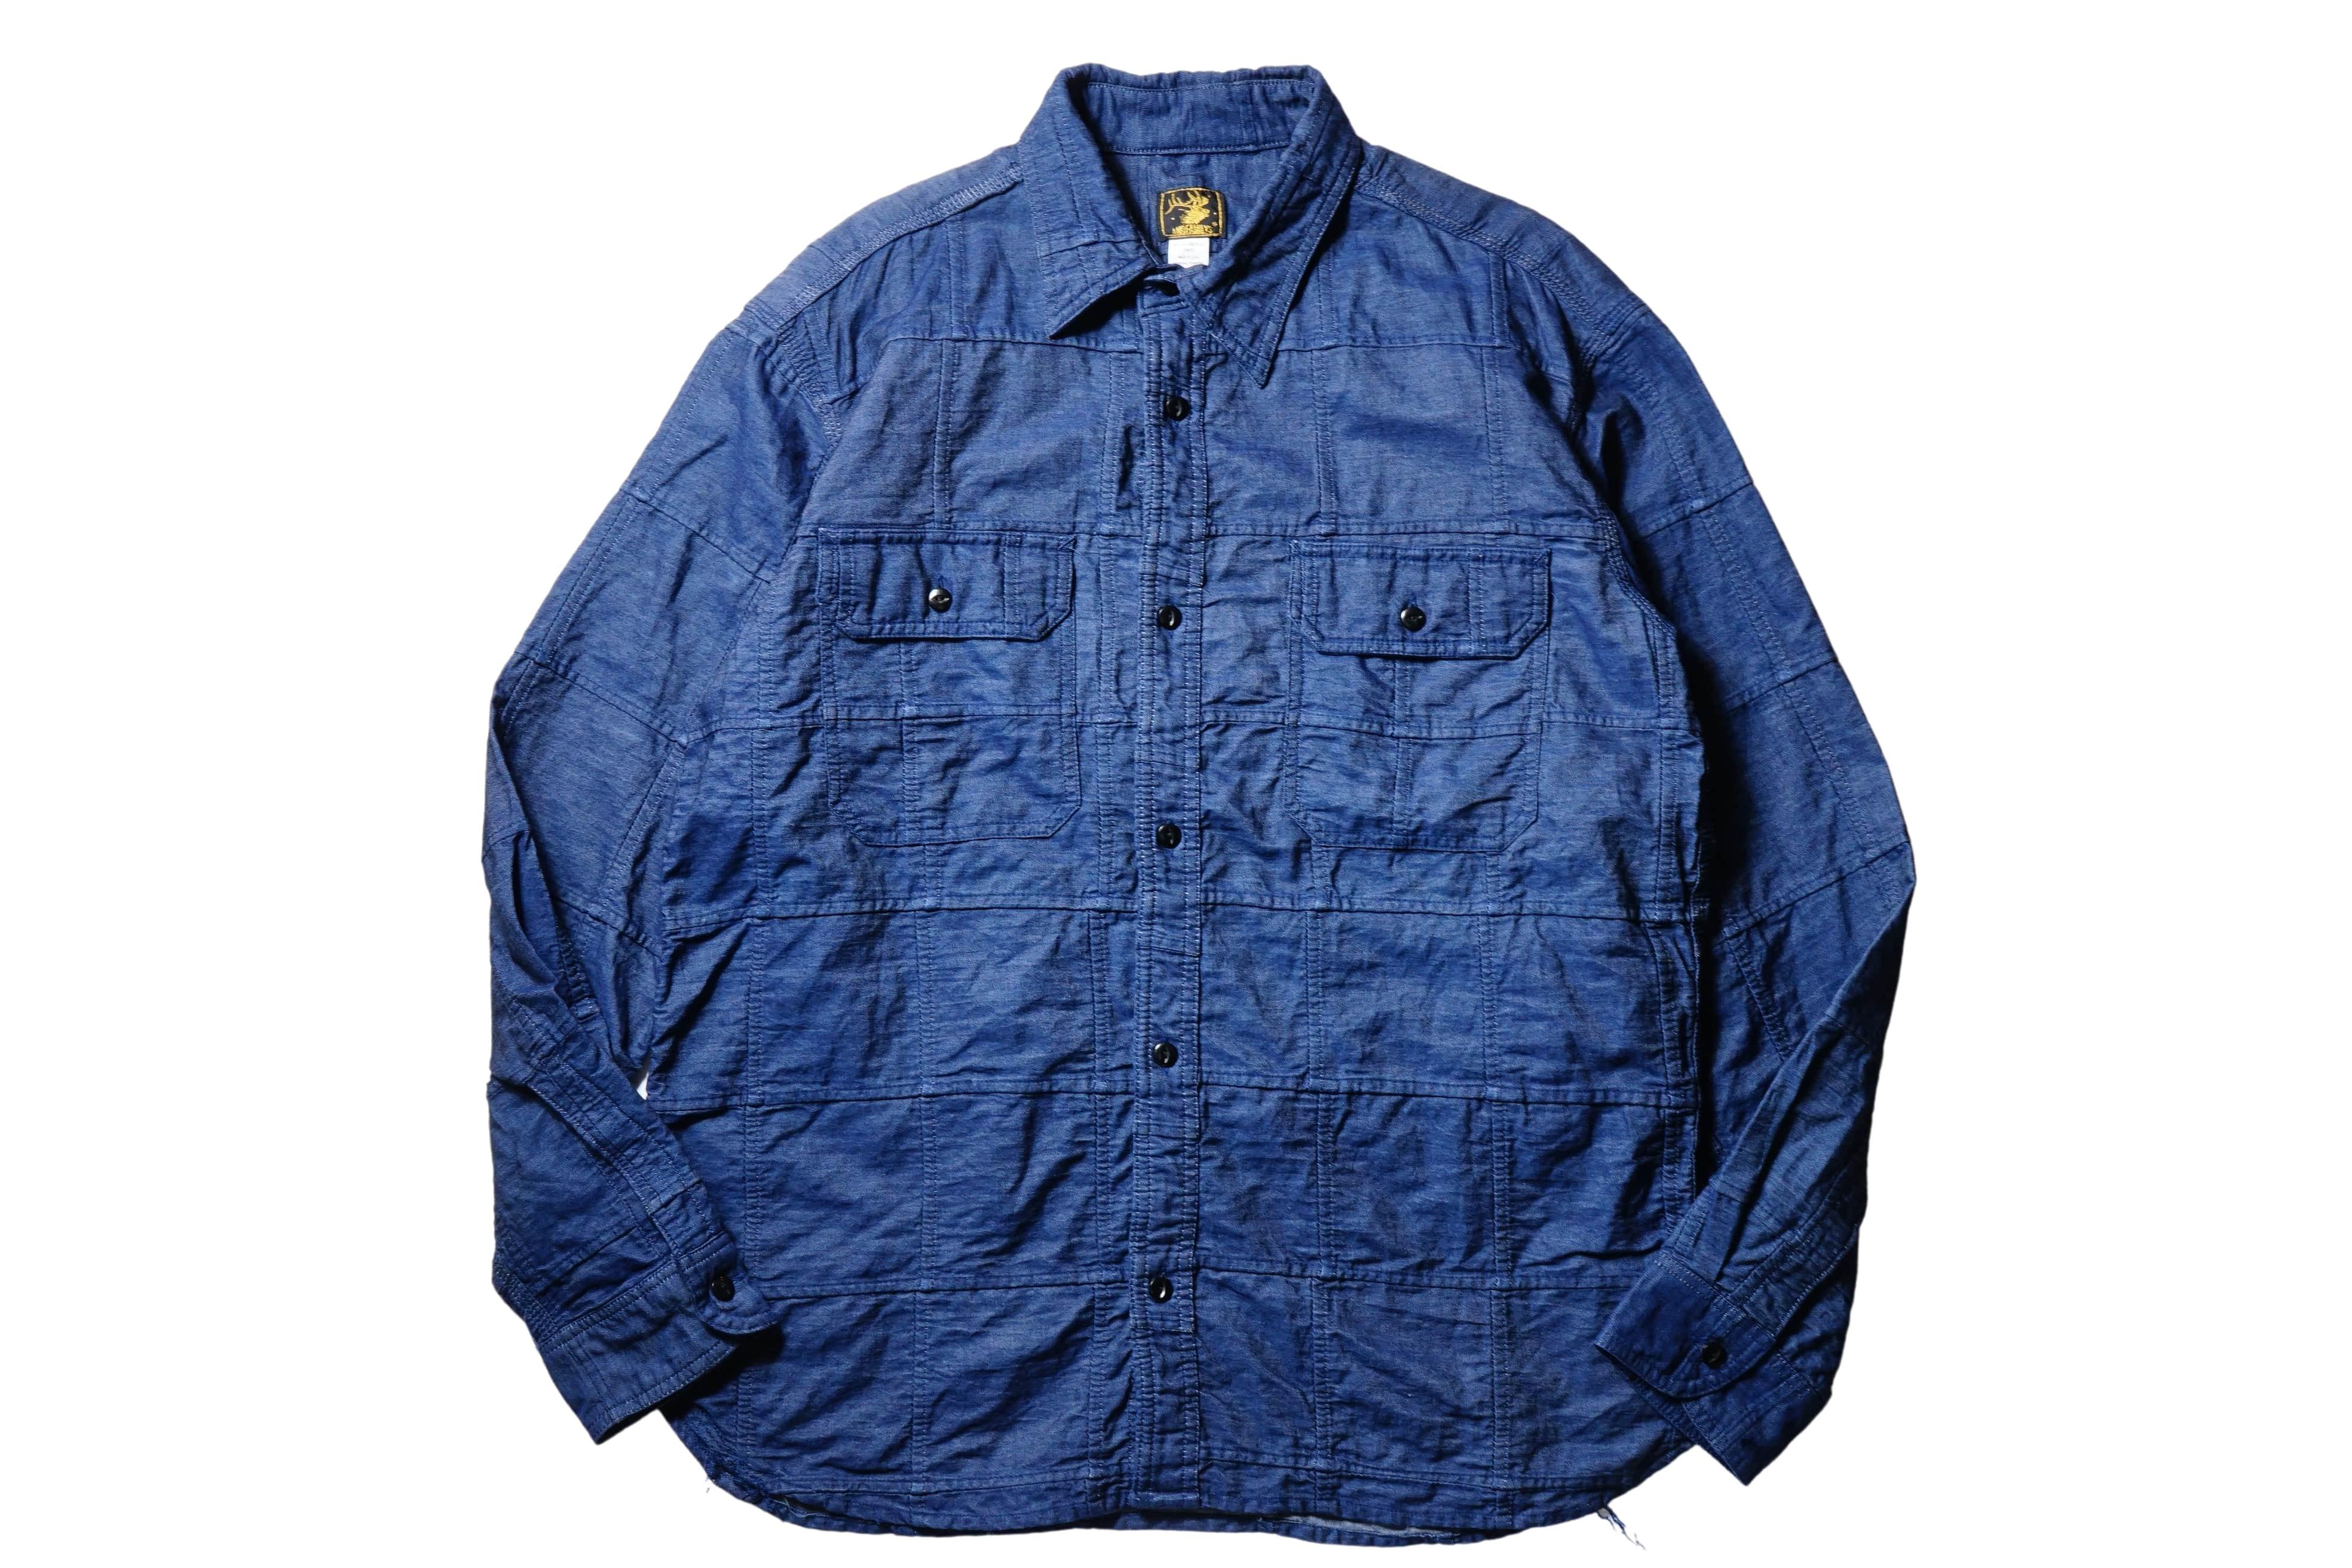 ANDFAMILYS /アンドファミリーズ Indigo Crash Patchwork Shirts